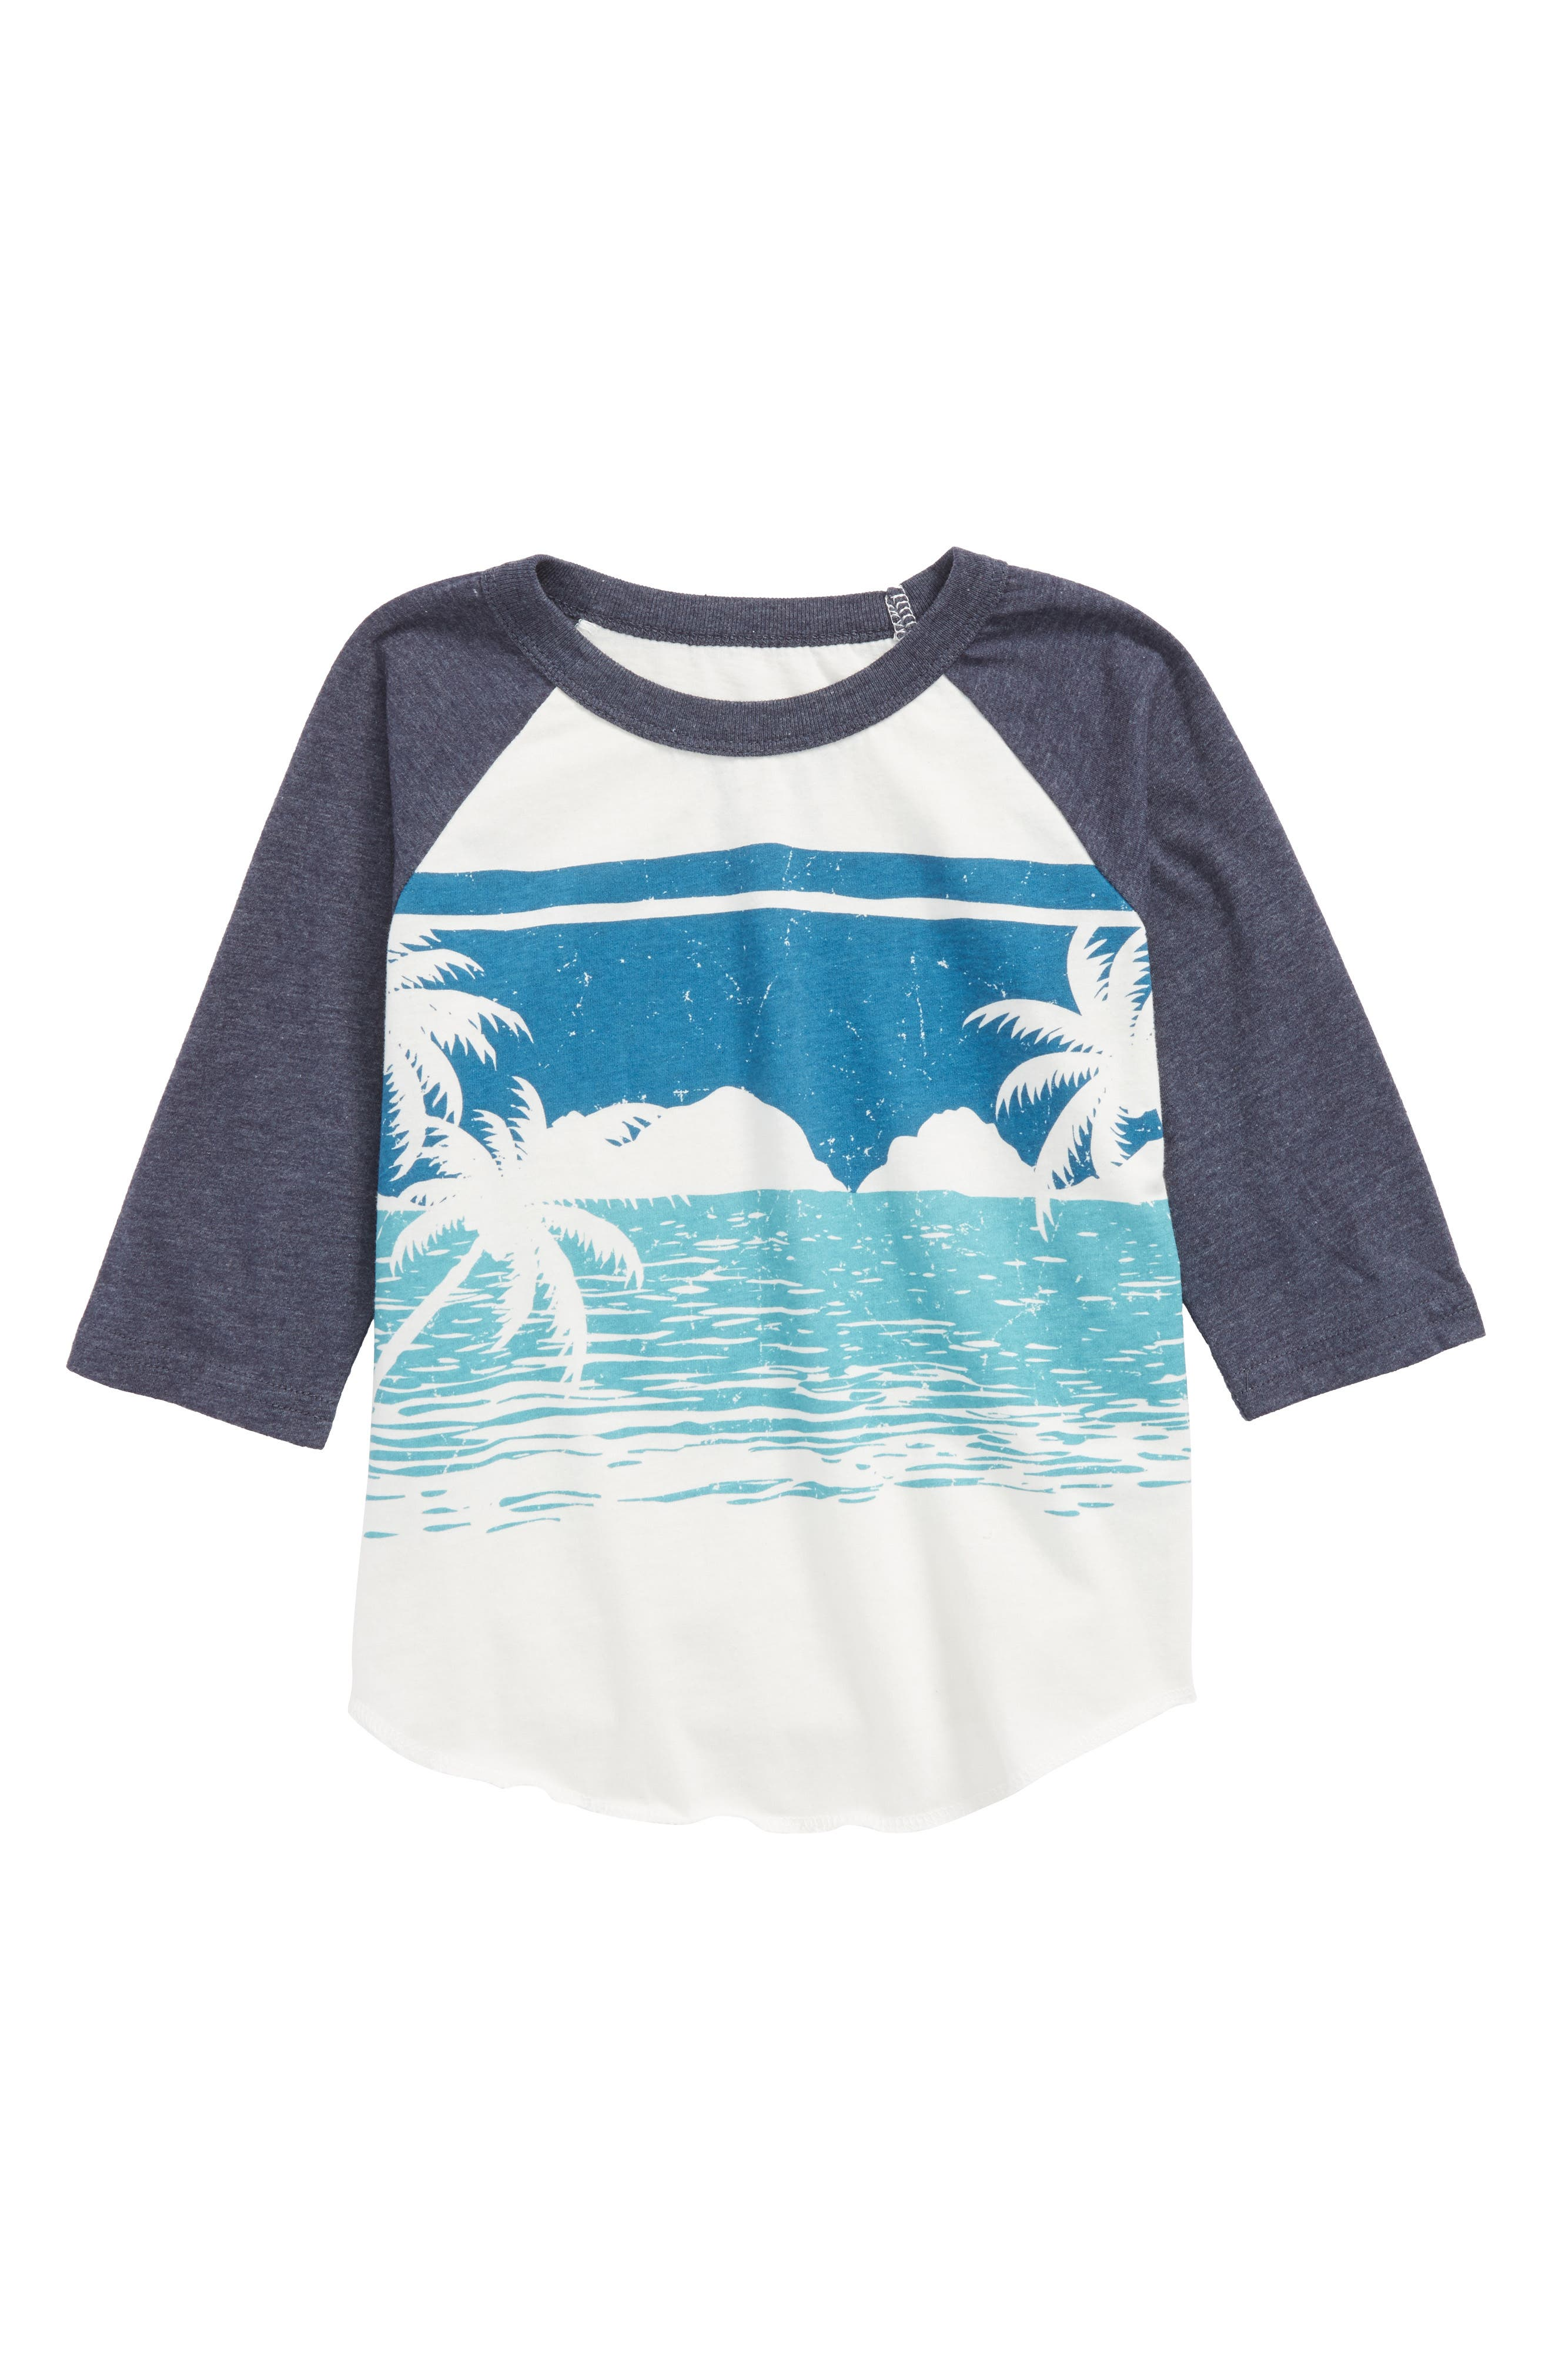 Ocean View Raglan T-Shirt,                             Main thumbnail 1, color,                             400